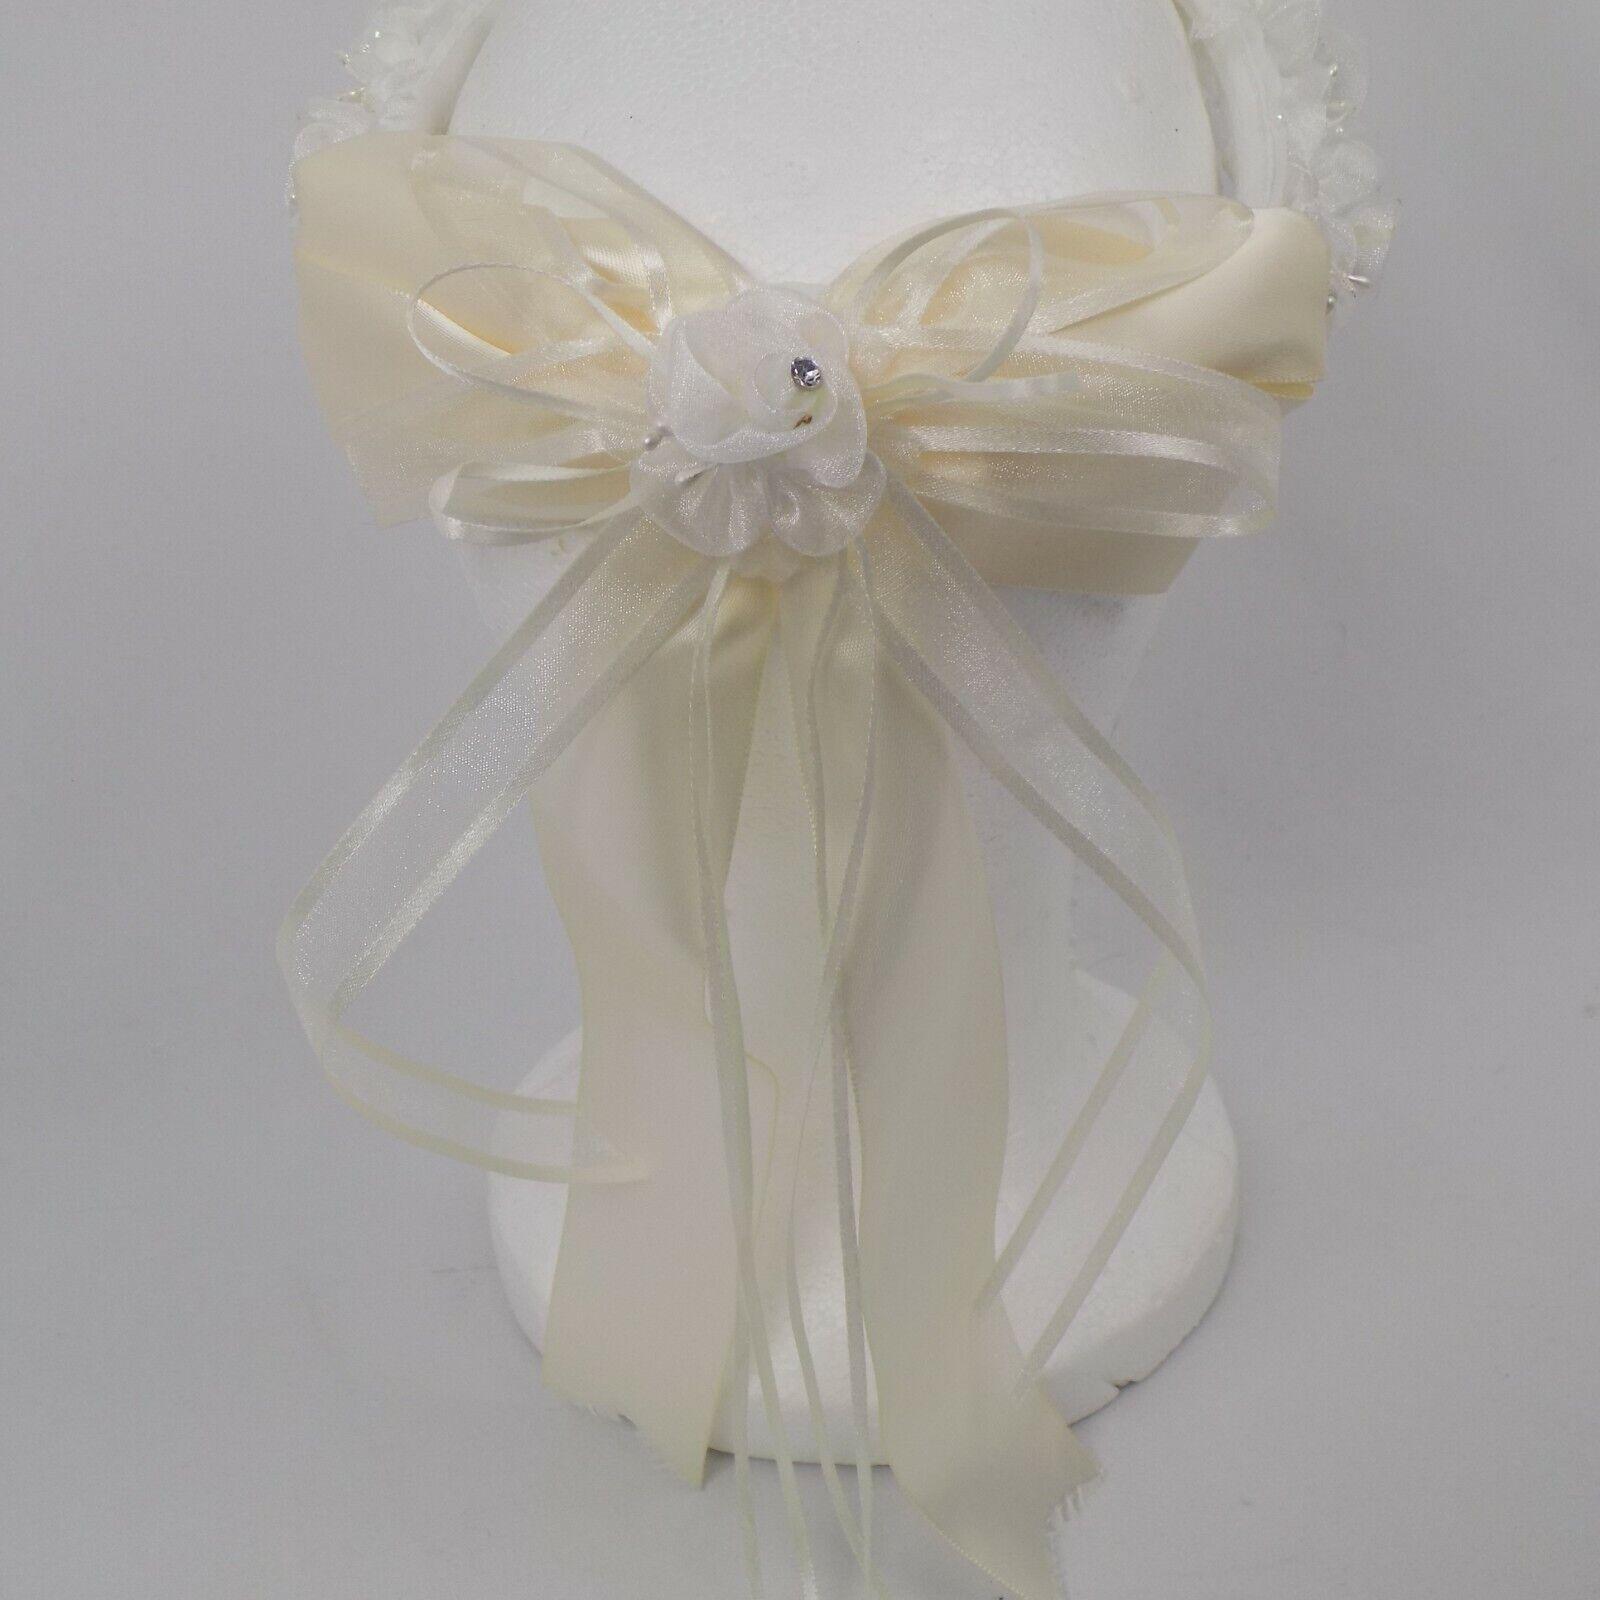 Flower Girl Wedding Headband 7 inch diameter Princess Easter Formal Cosplay